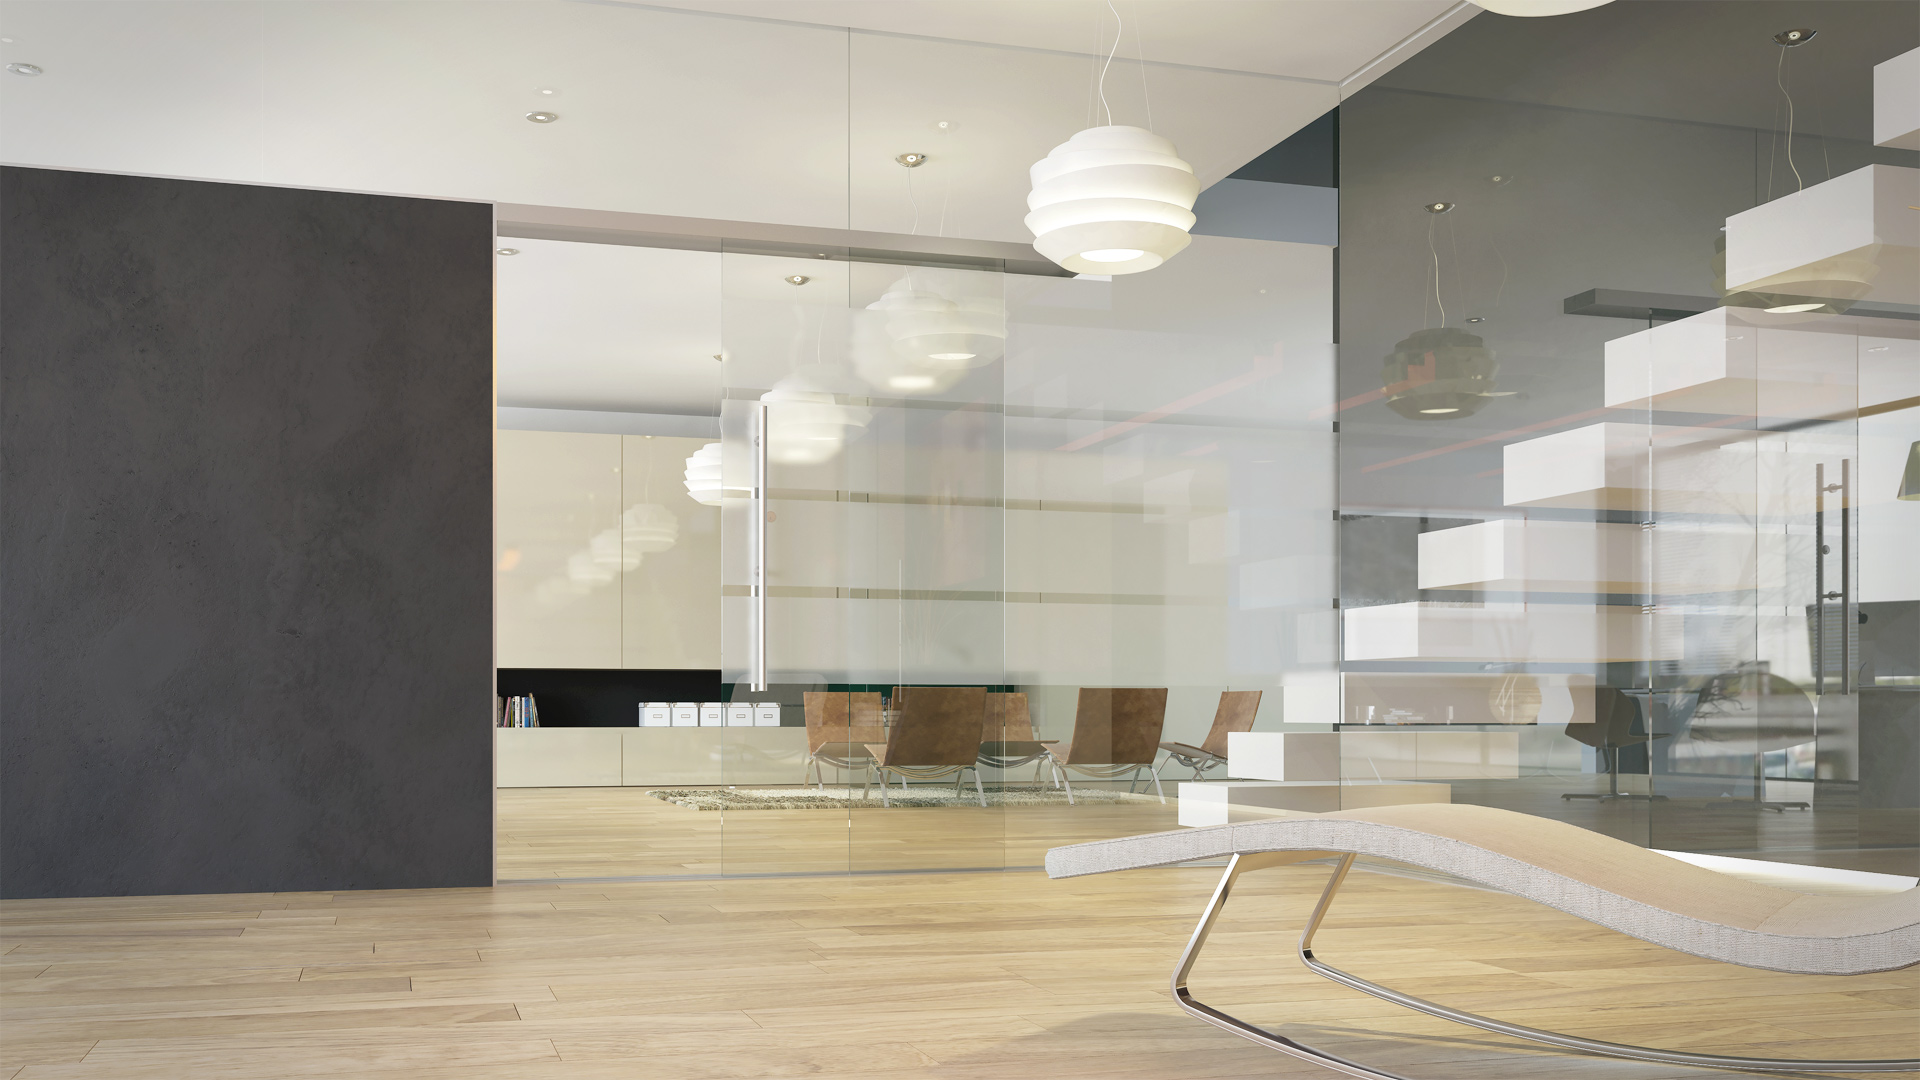 laurent nicolas laurent nicolas. Black Bedroom Furniture Sets. Home Design Ideas